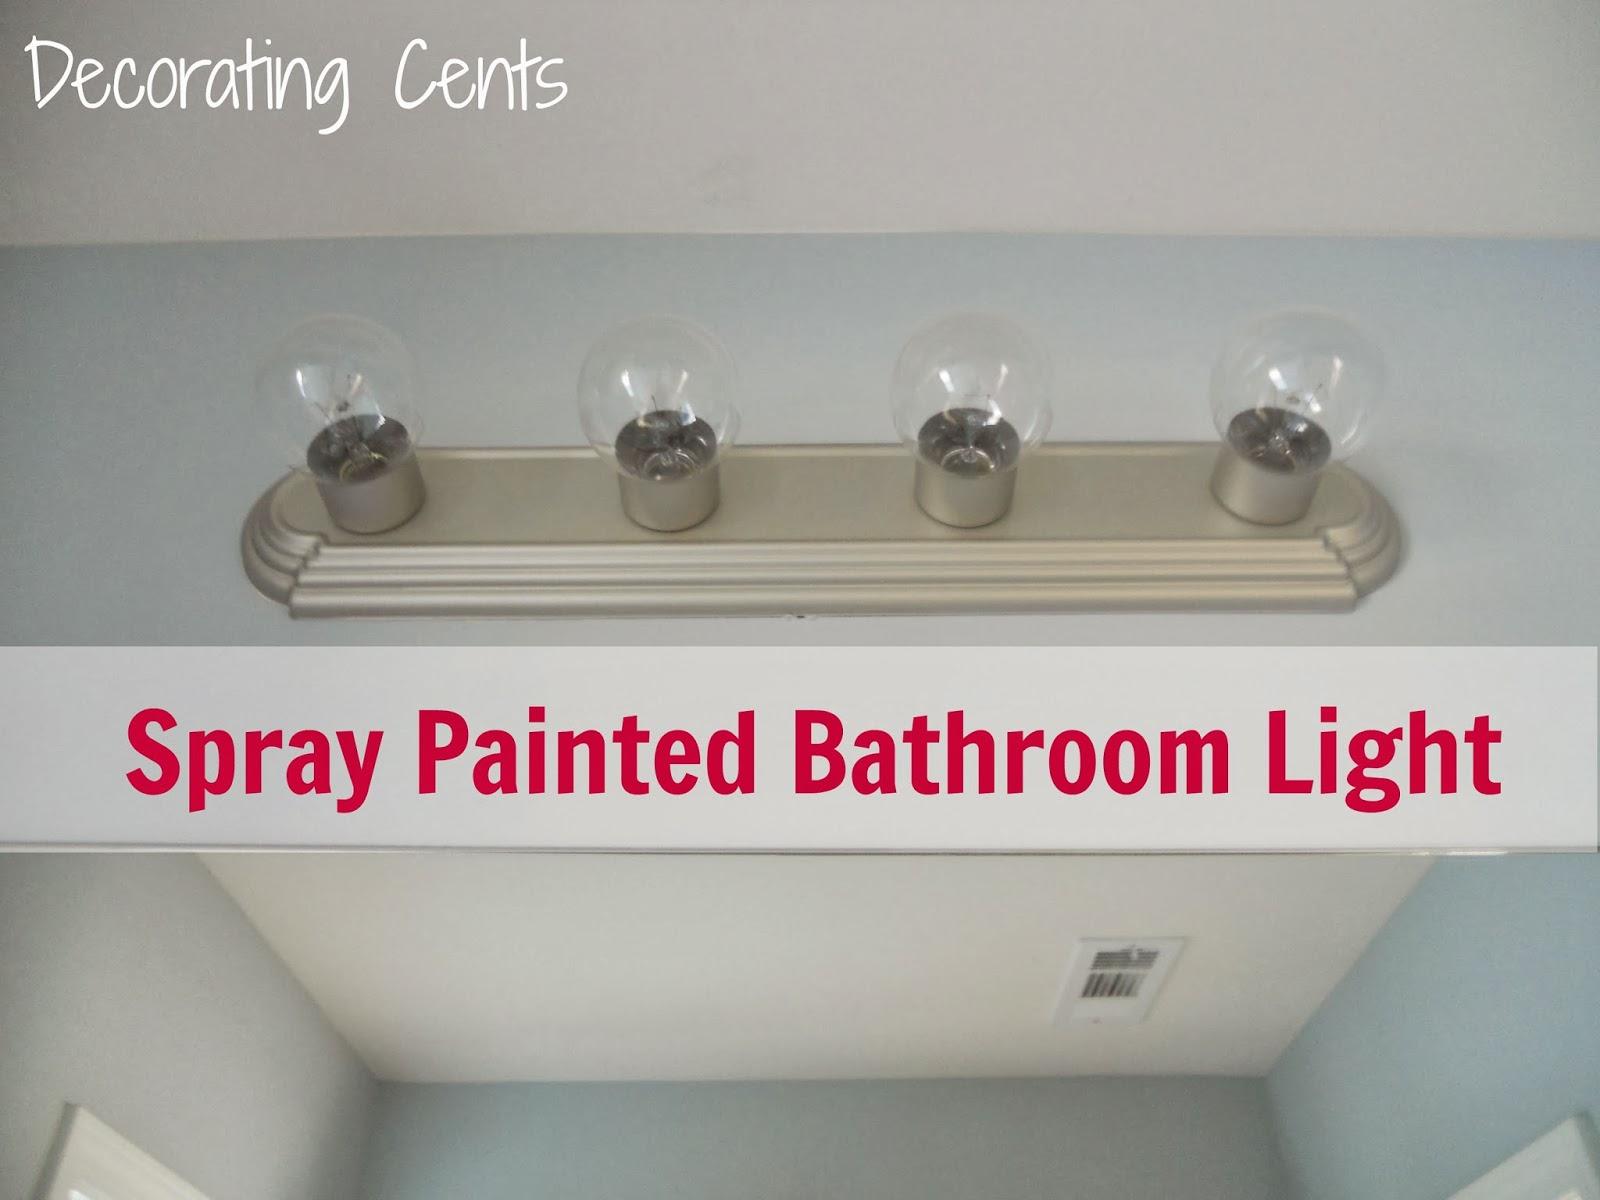 Yosemite Home Decor Vanity Lighting Family 4 Light Chrome: Decorating Cents: Spray Painted Bathroom Light